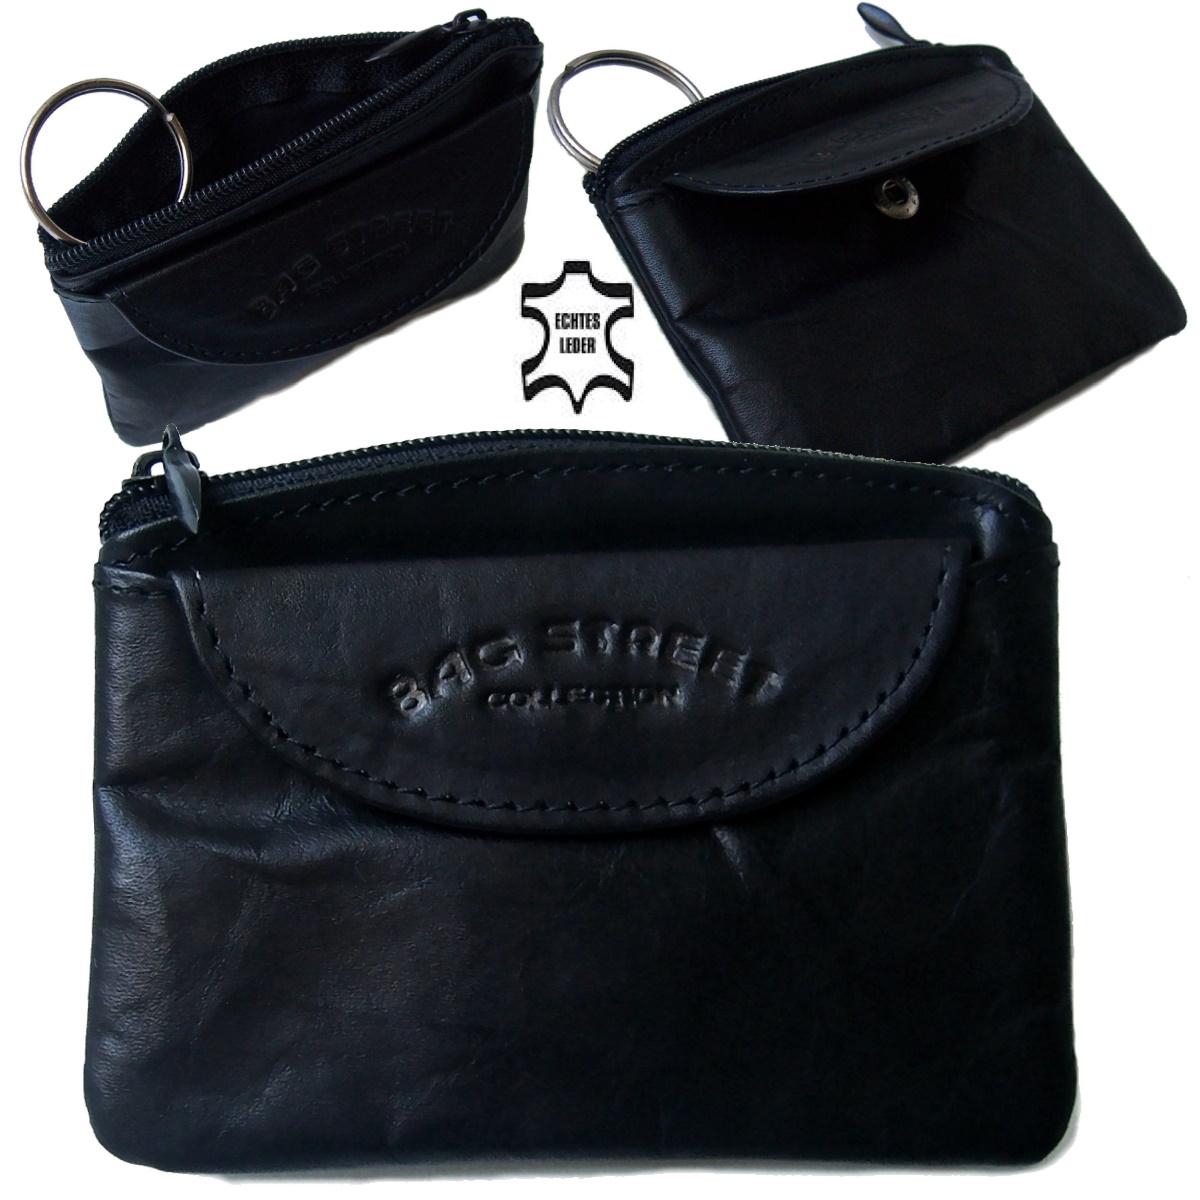 Sc2134* Schlüsseltasche Bag Street 10x7,5cm  Leder black 1Schlüsselring